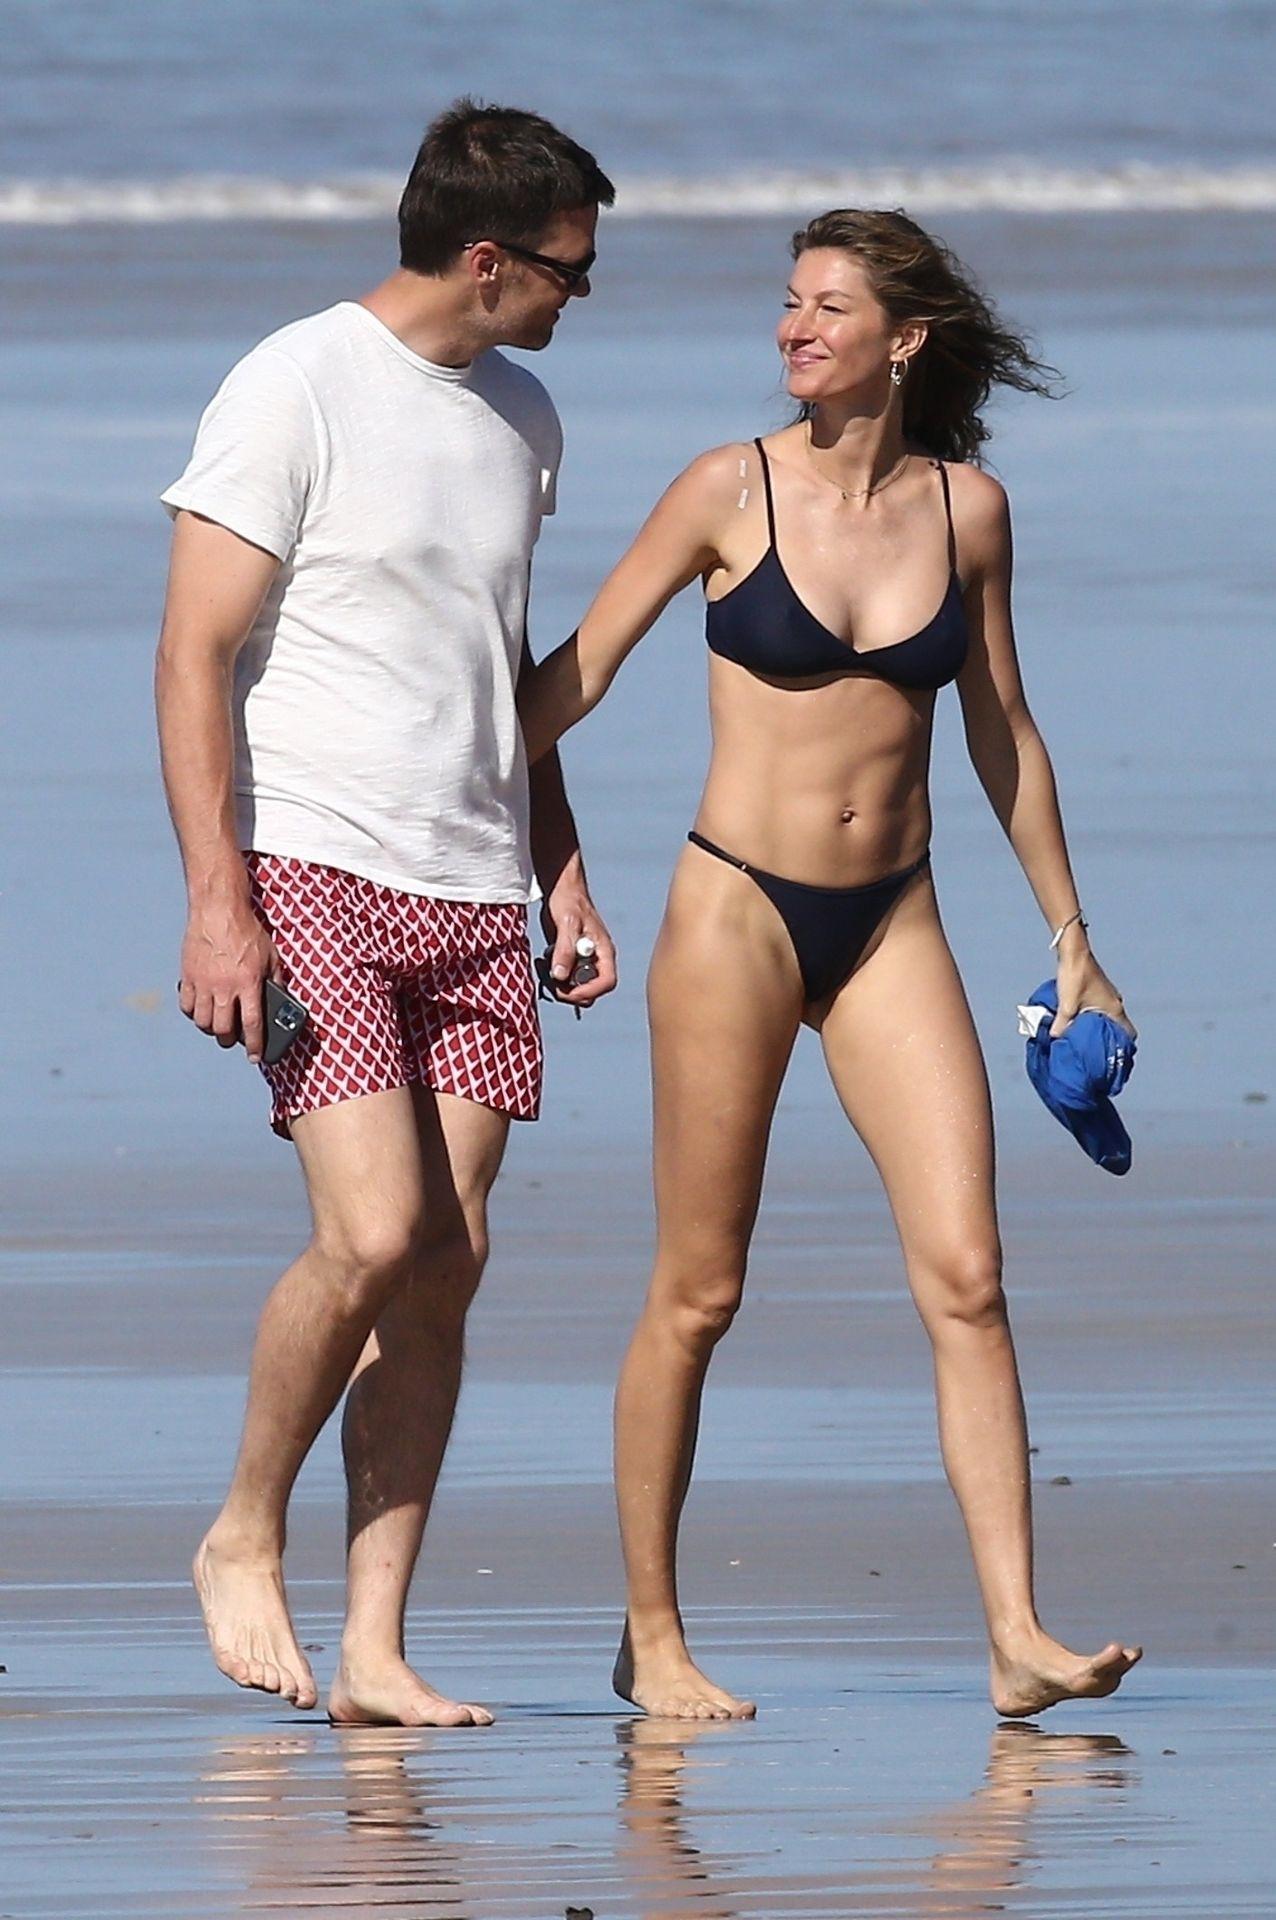 Tom Brady & Gisele Bundchen Pack On The Pda At The Beach 0023